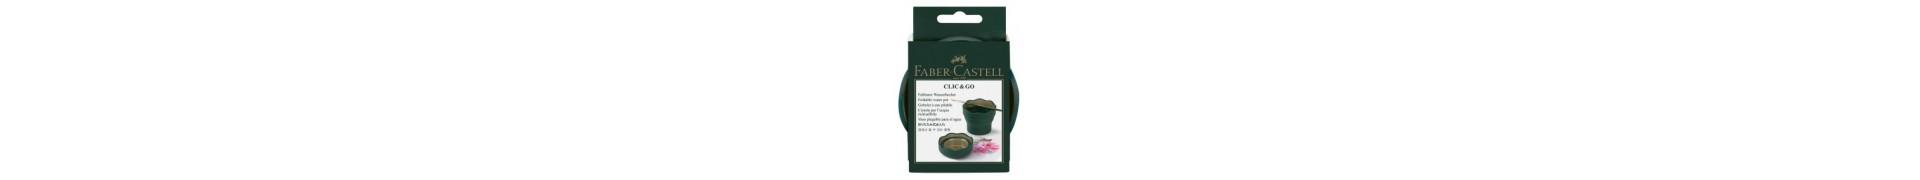 Gobelet à eau FABER & CASTELL - CLIC & GO - Vert